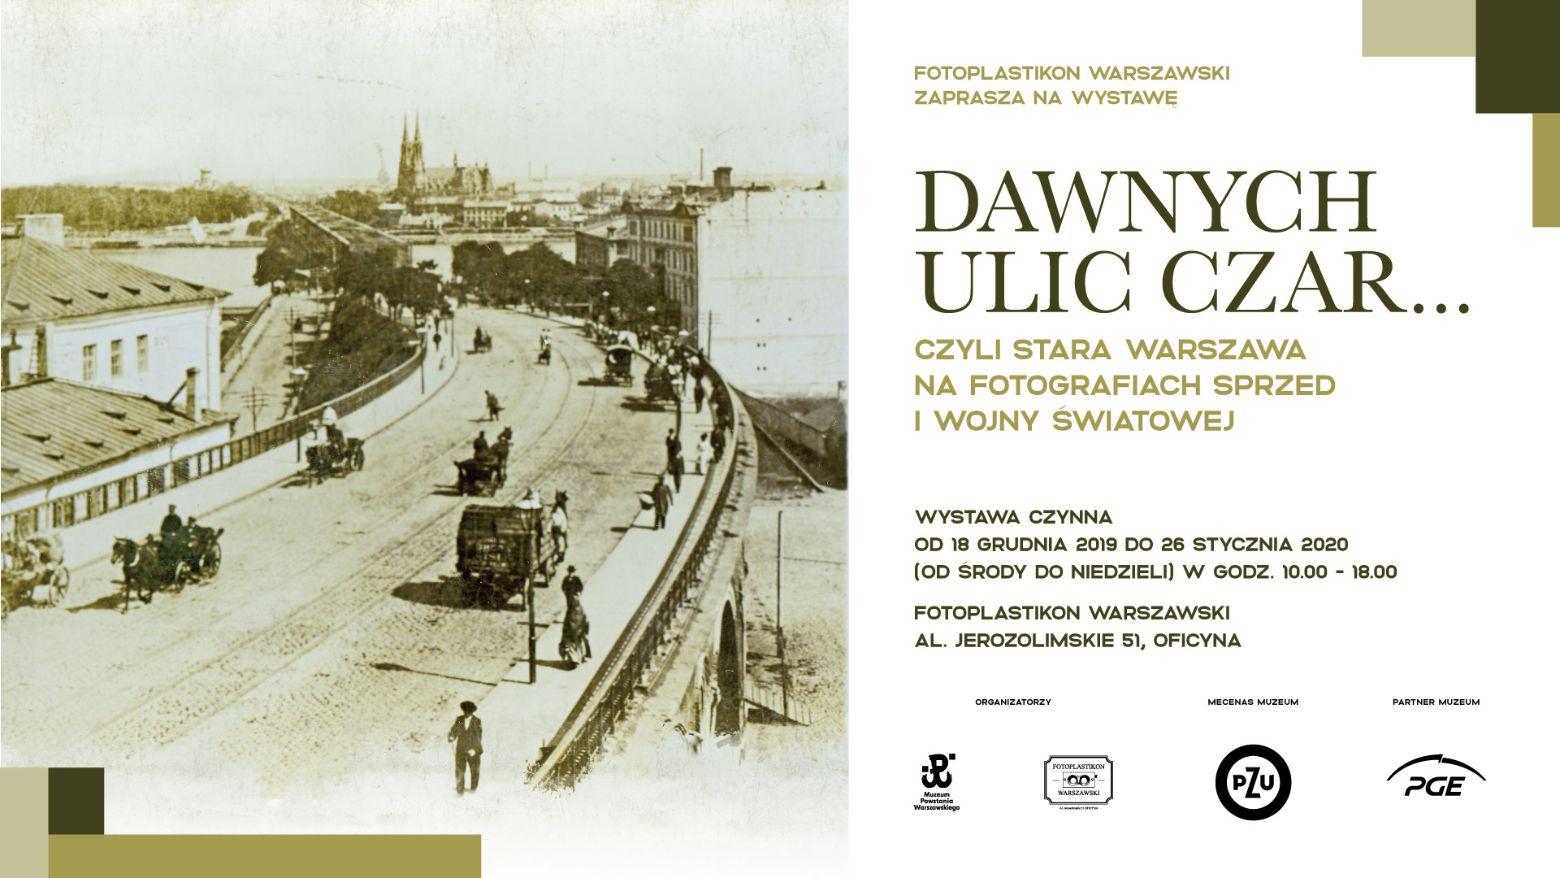 Fotoplastikon-Dawnych-ulic-czar--Facebook-1920x1080